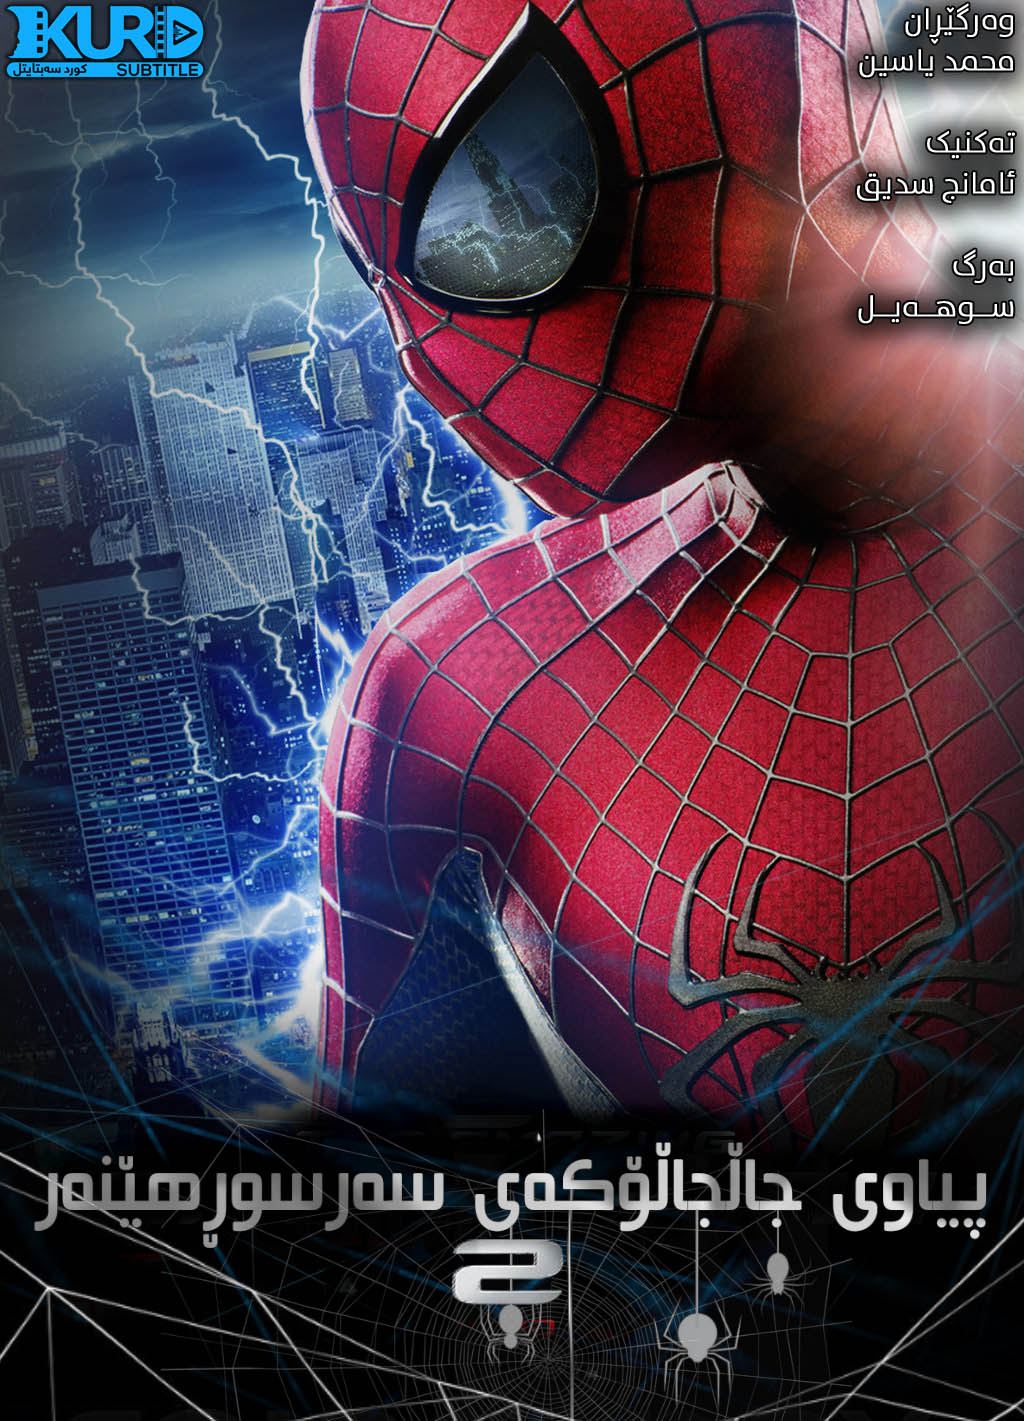 The Amazing Spider-Man 2 kurdish poster